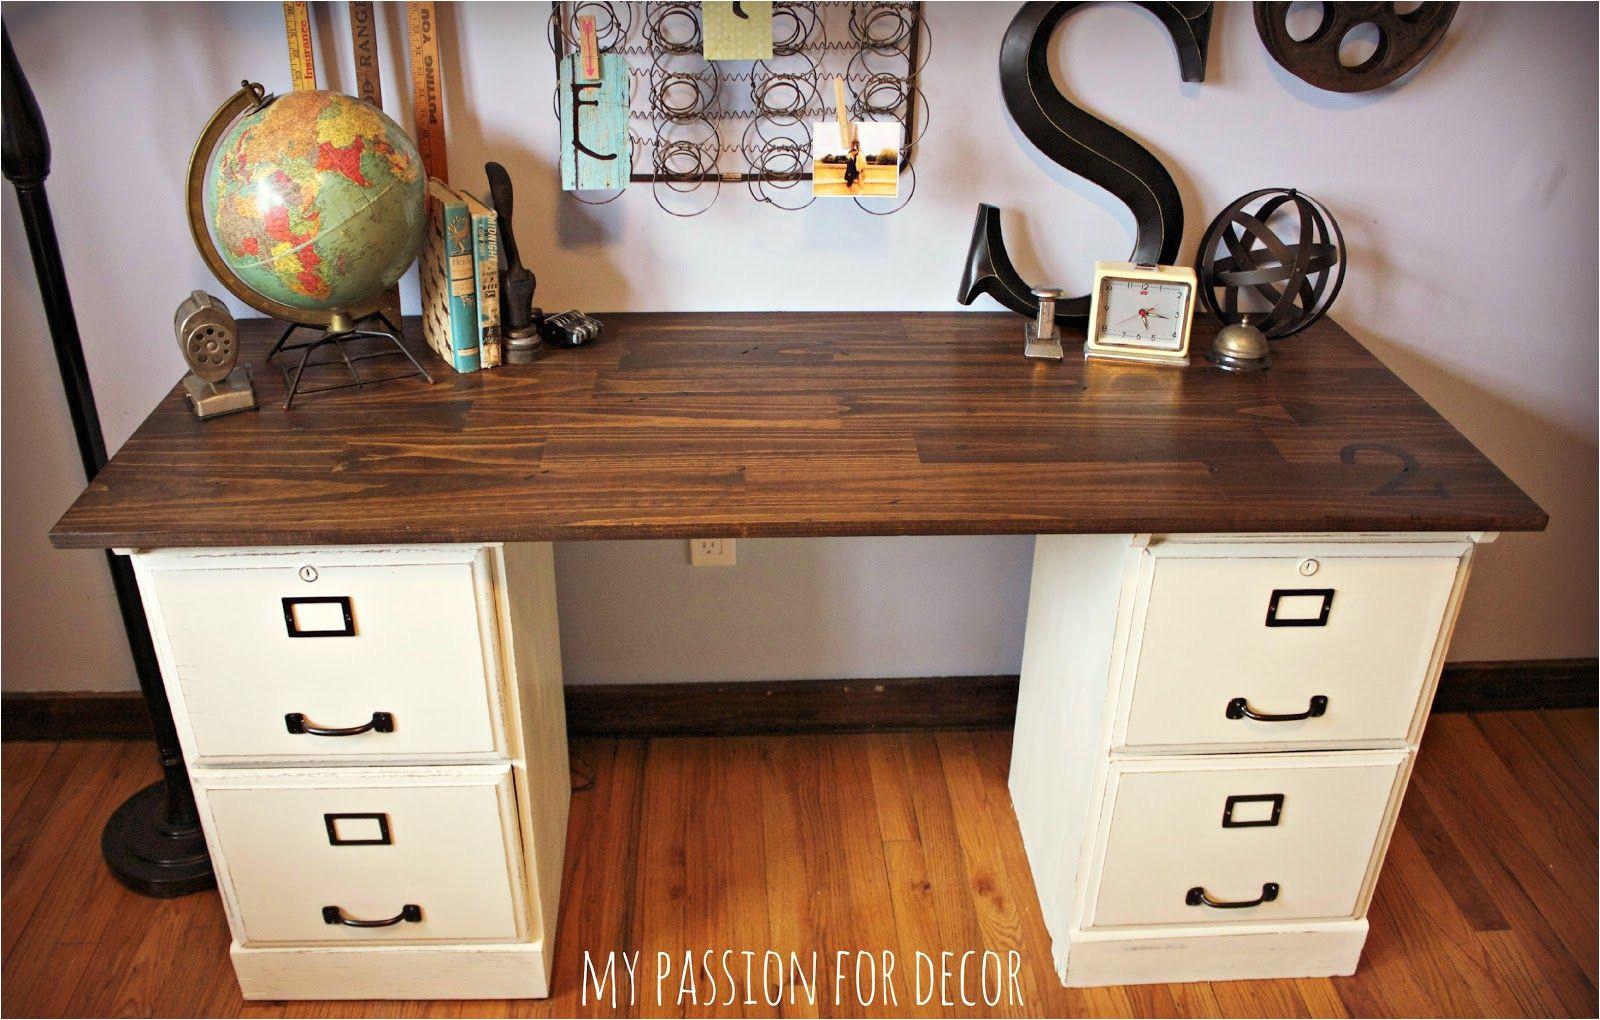 File Cabinet Corner Desk Diy Pottery Barn Inspired Desk Using Goodwill Filing Cabinets In 2019